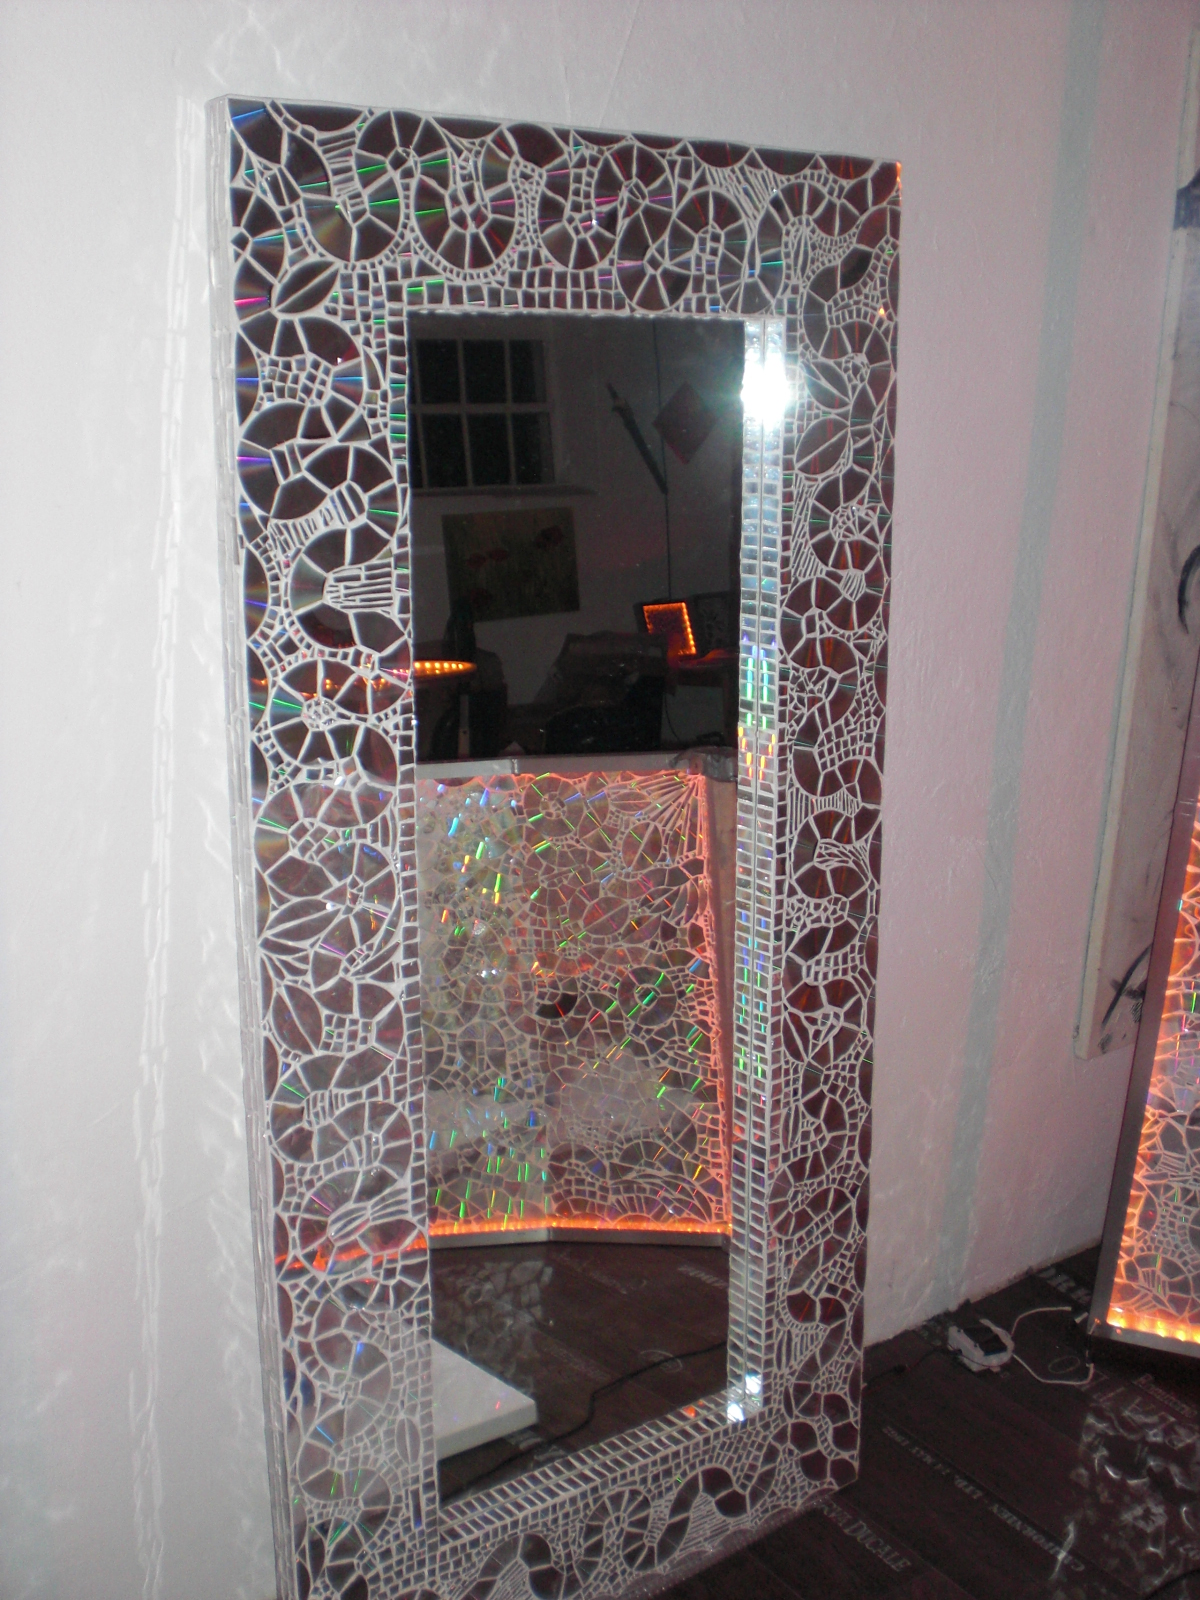 energie spiegel 95 cm x 190 cm cm mit wei en konturen. Black Bedroom Furniture Sets. Home Design Ideas